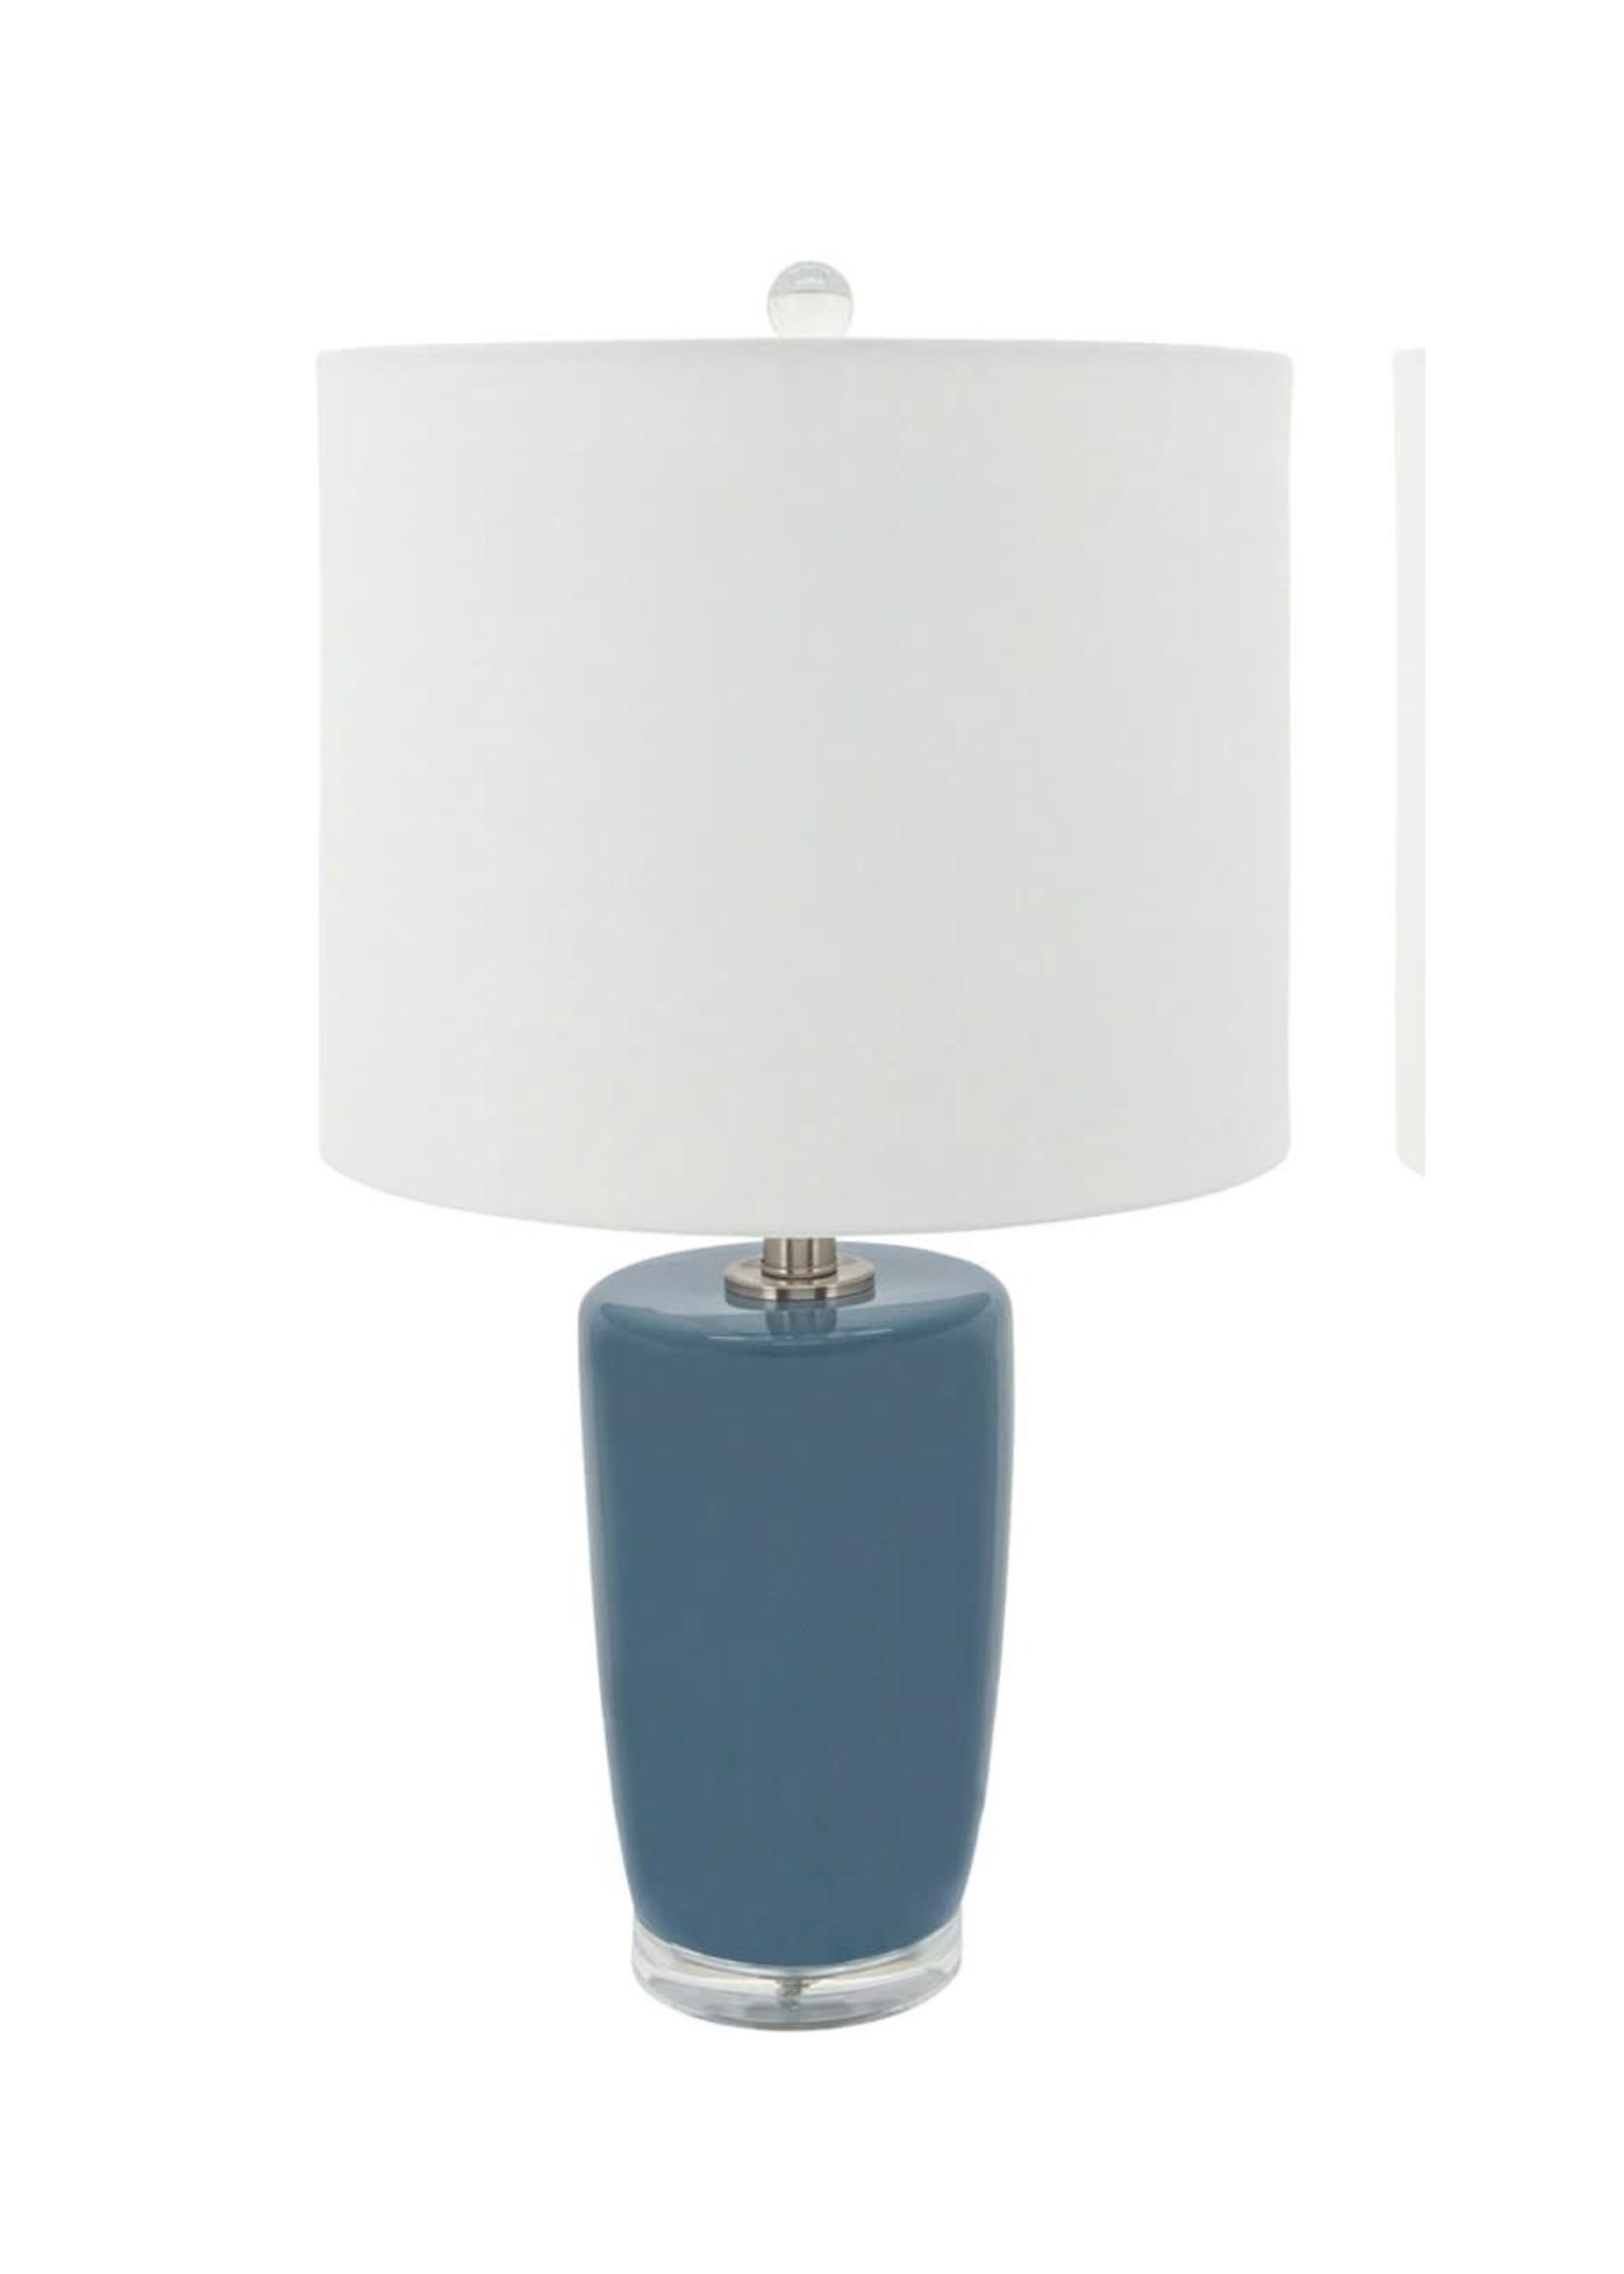 Sagebrook Home Ceramic Table Lamp Blue